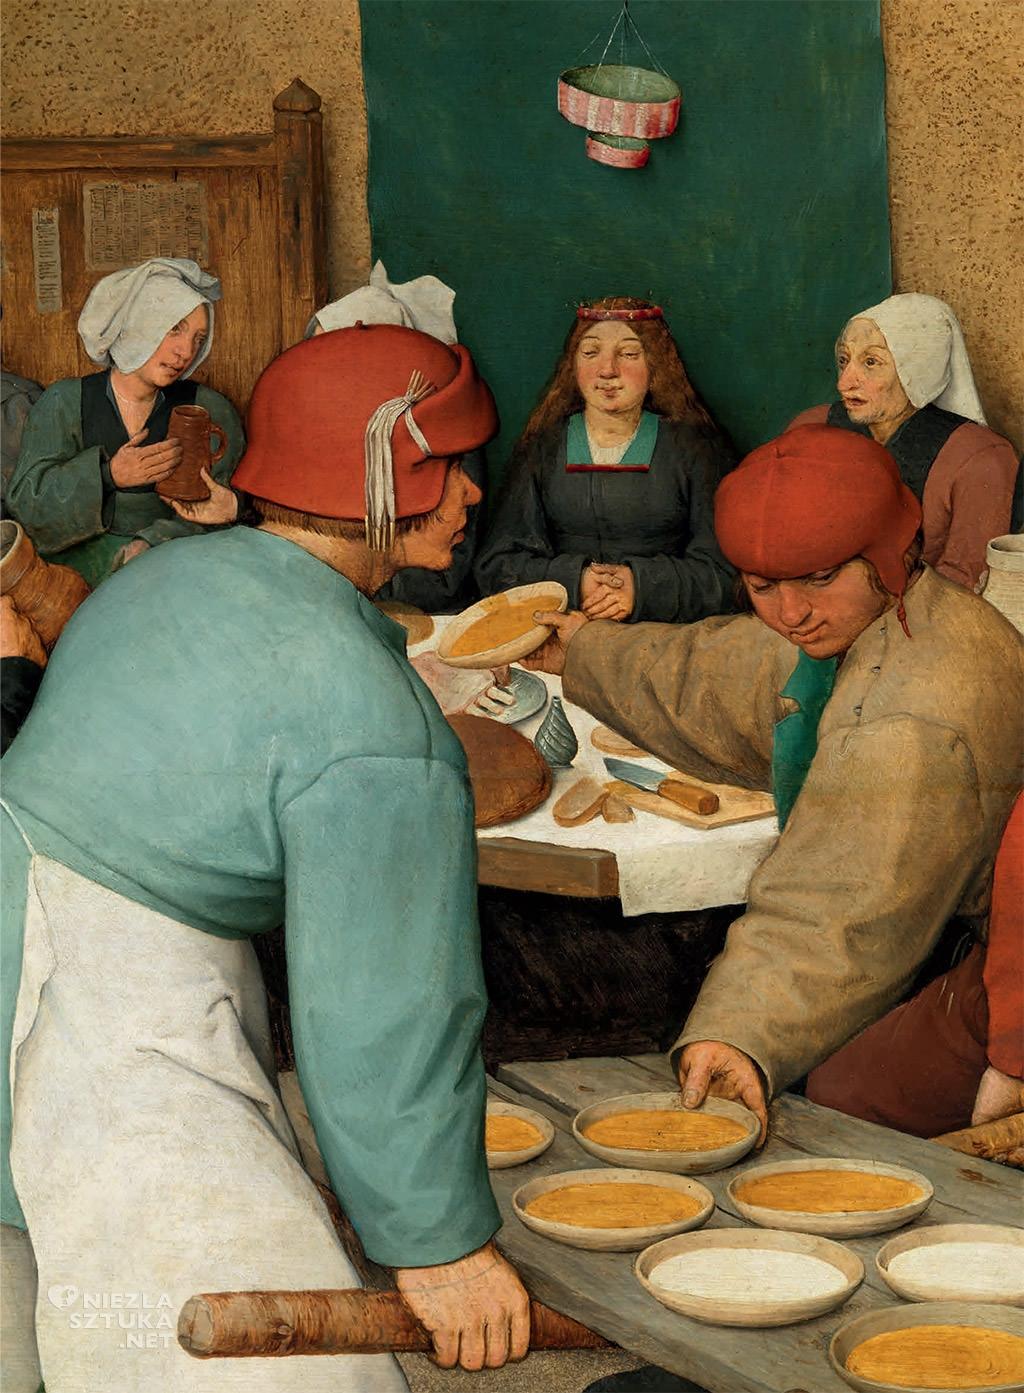 Bruegel complete works Taschen Niezła sztuka